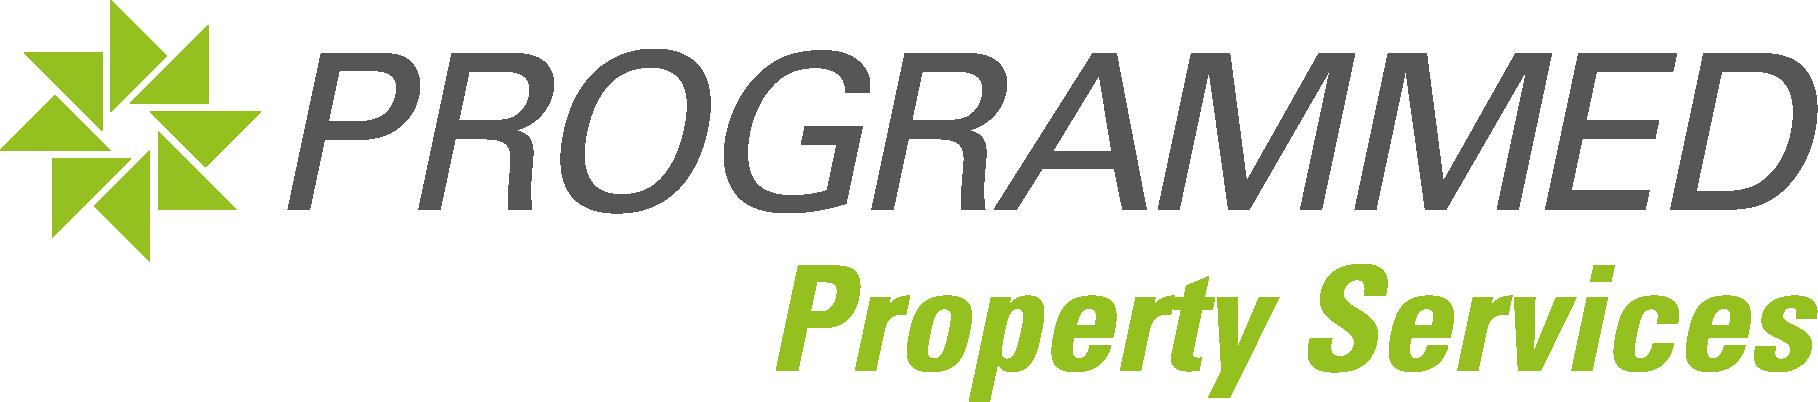 Programmed Property Services logo